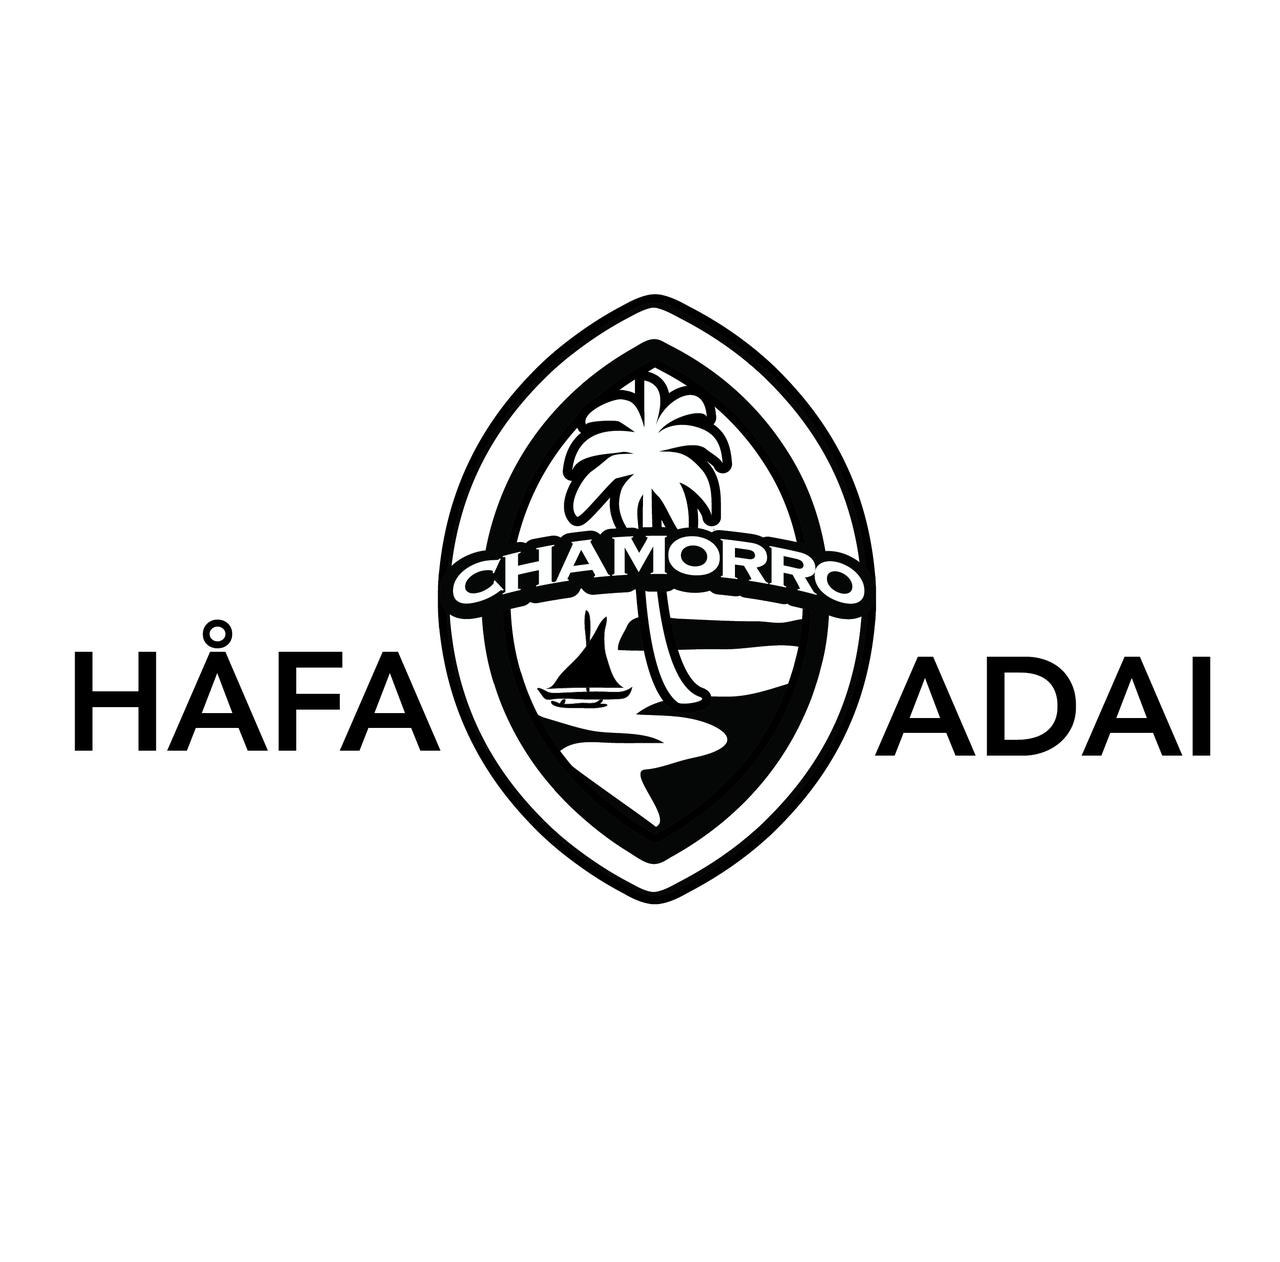 Hafa adai chamorro guam seal decal choose color 14 inches wide